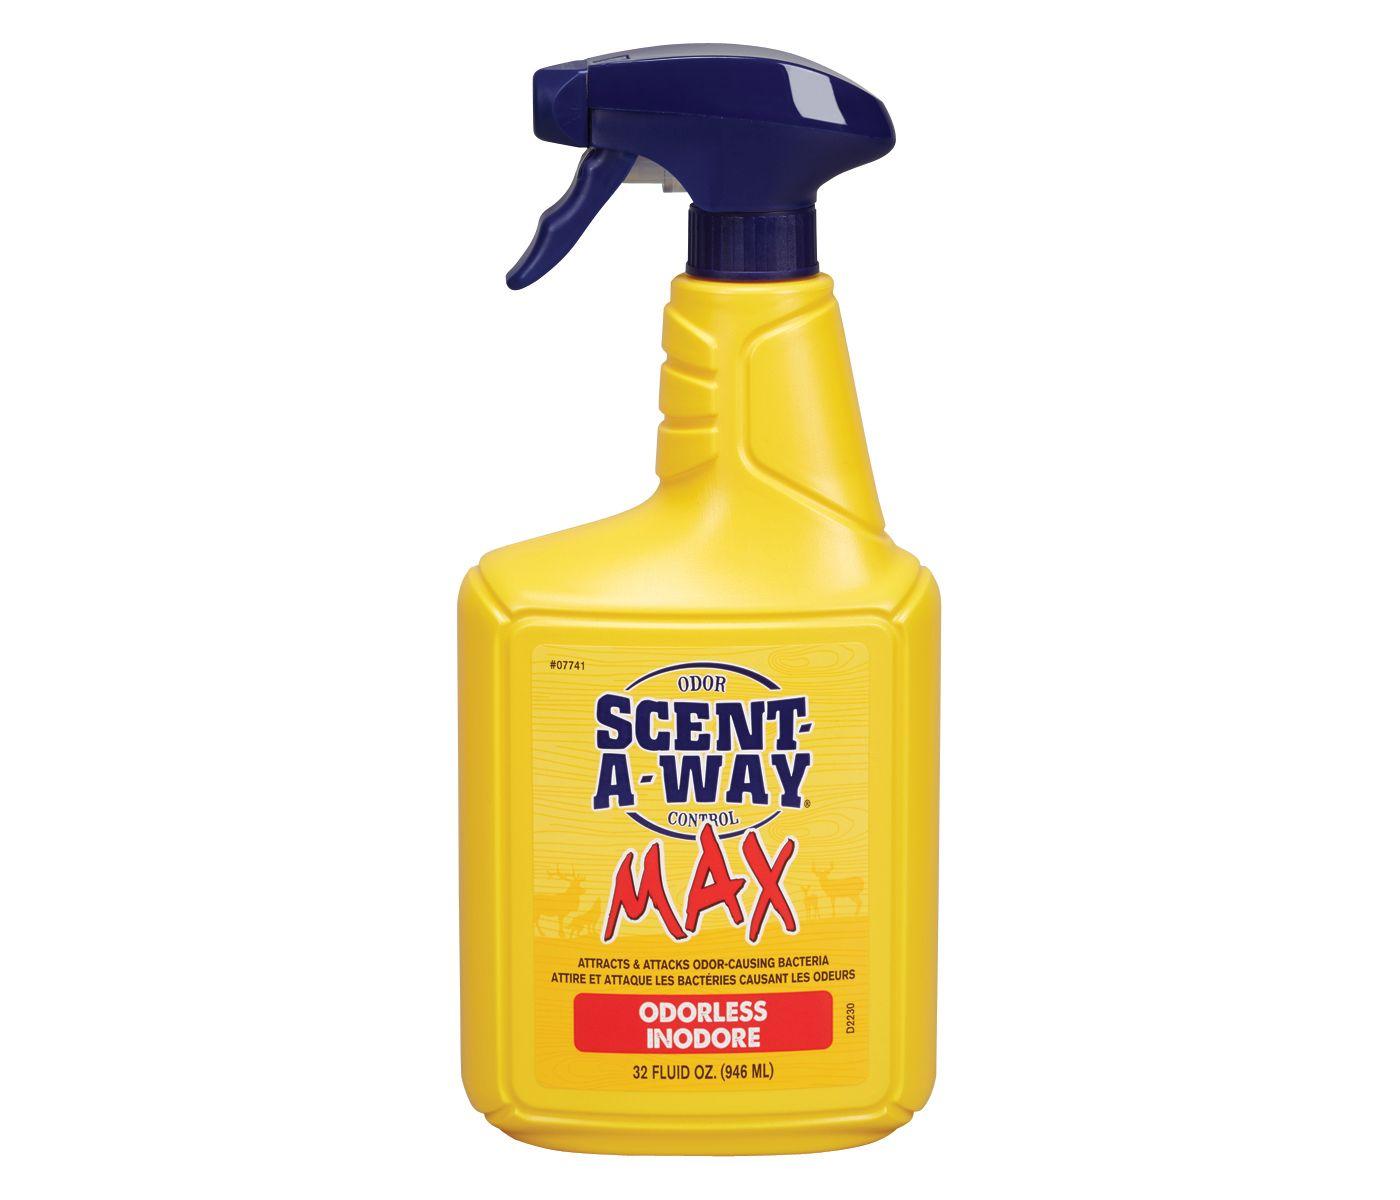 Hunters Specialties Scent-A-Way Max Odorless Spray